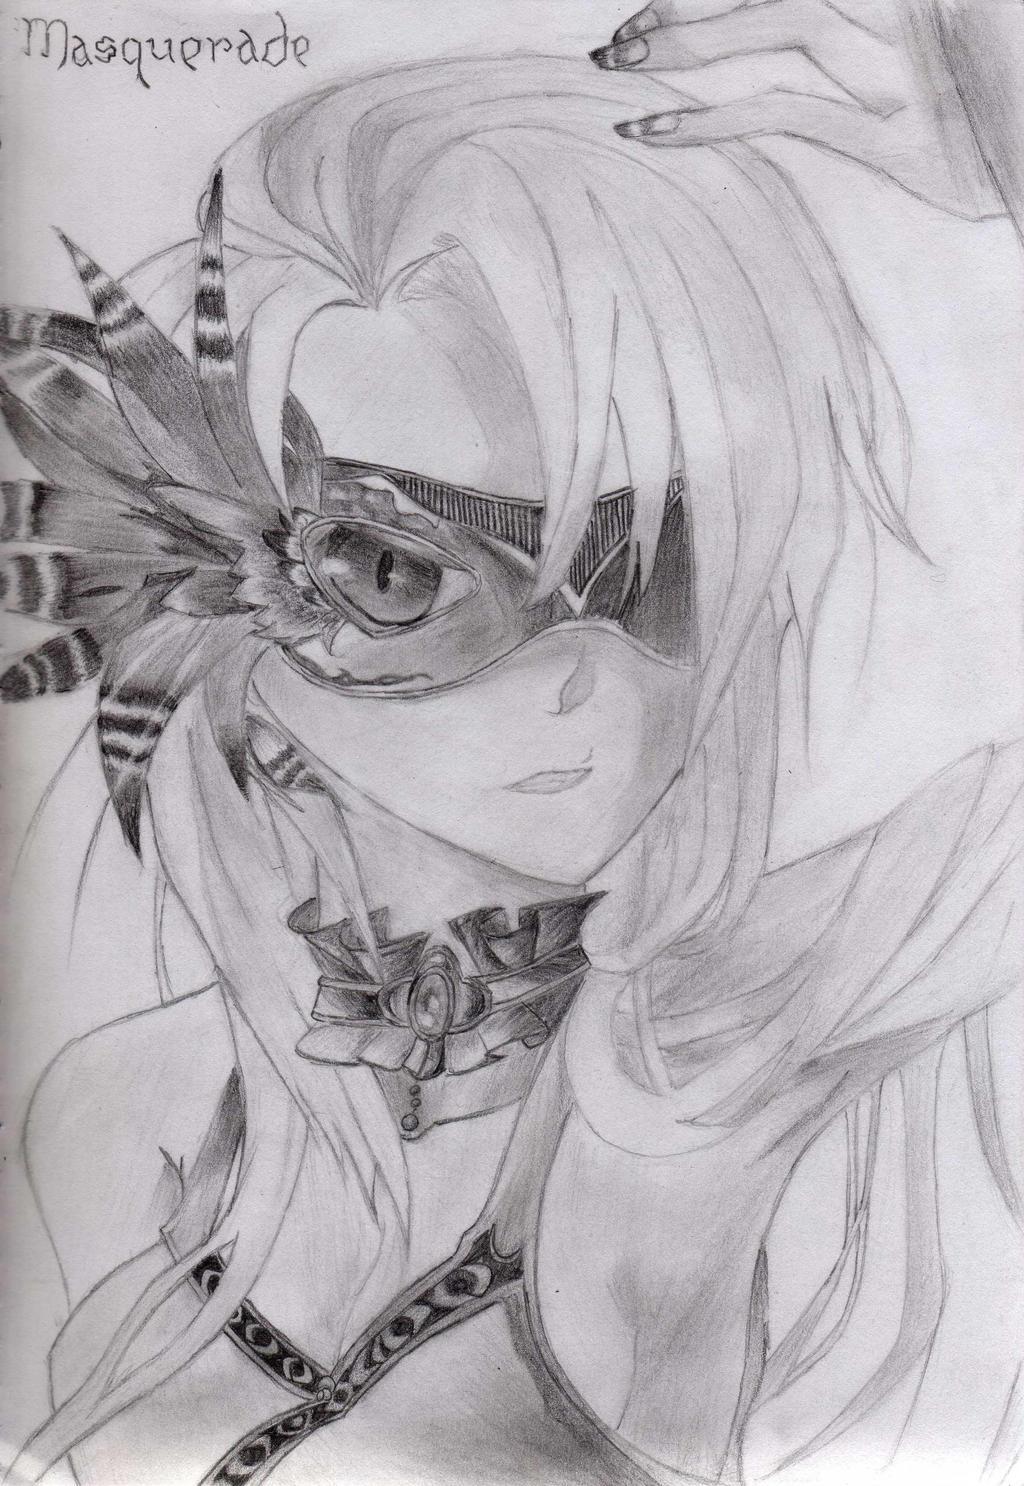 Masquerade By Xerofaezen On DeviantArt